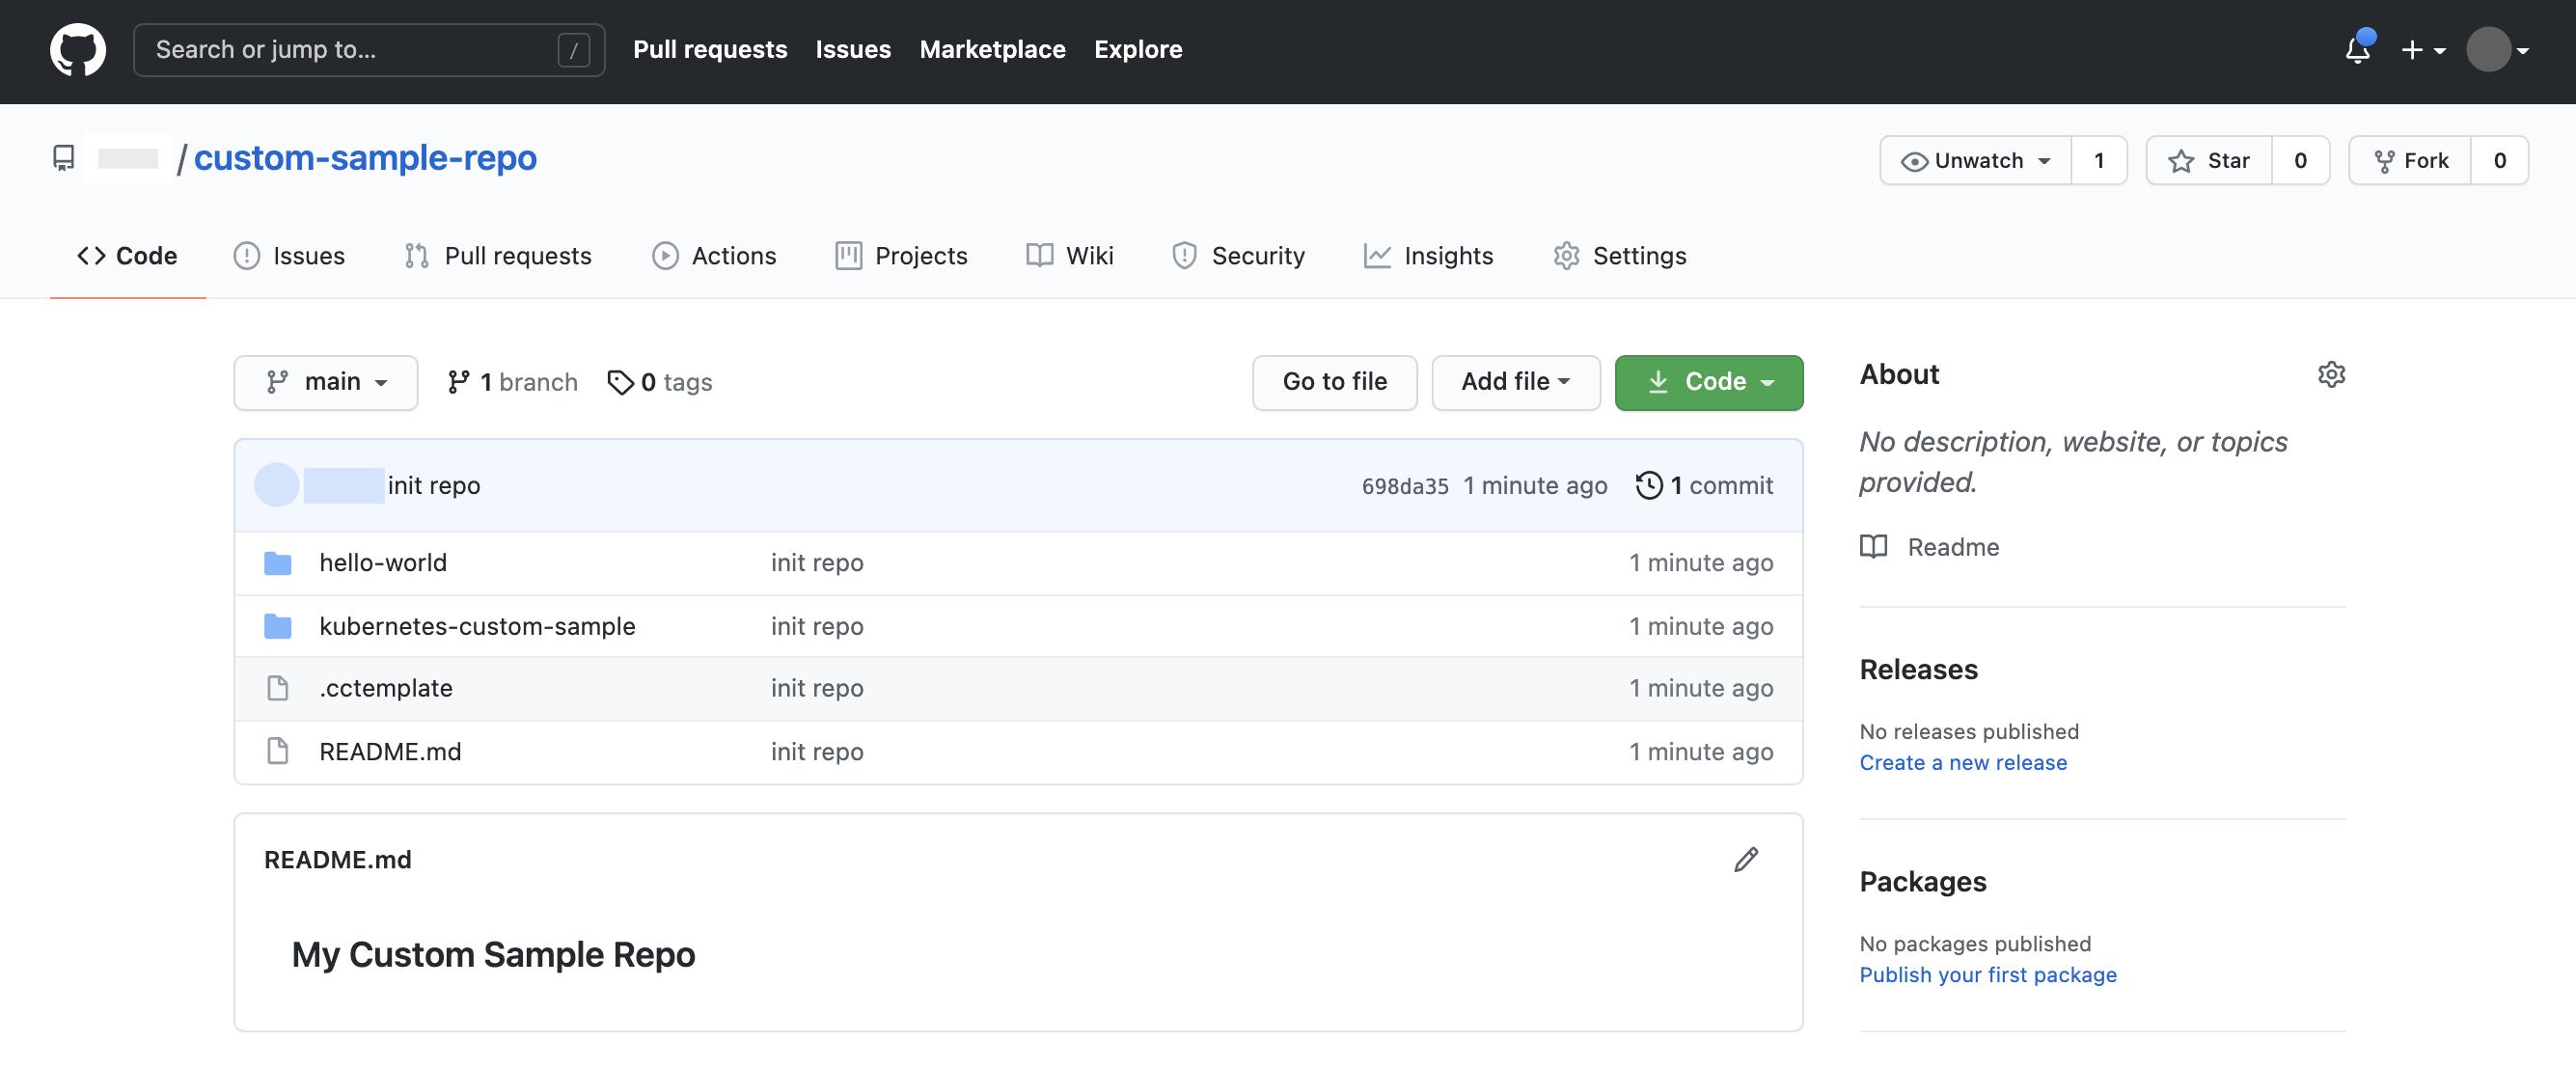 'hello-world' 및 'kubernetes-custom-sample'이라는 두 가지 기본 샘플 디렉터리가 있는 'custom-sample-repo'